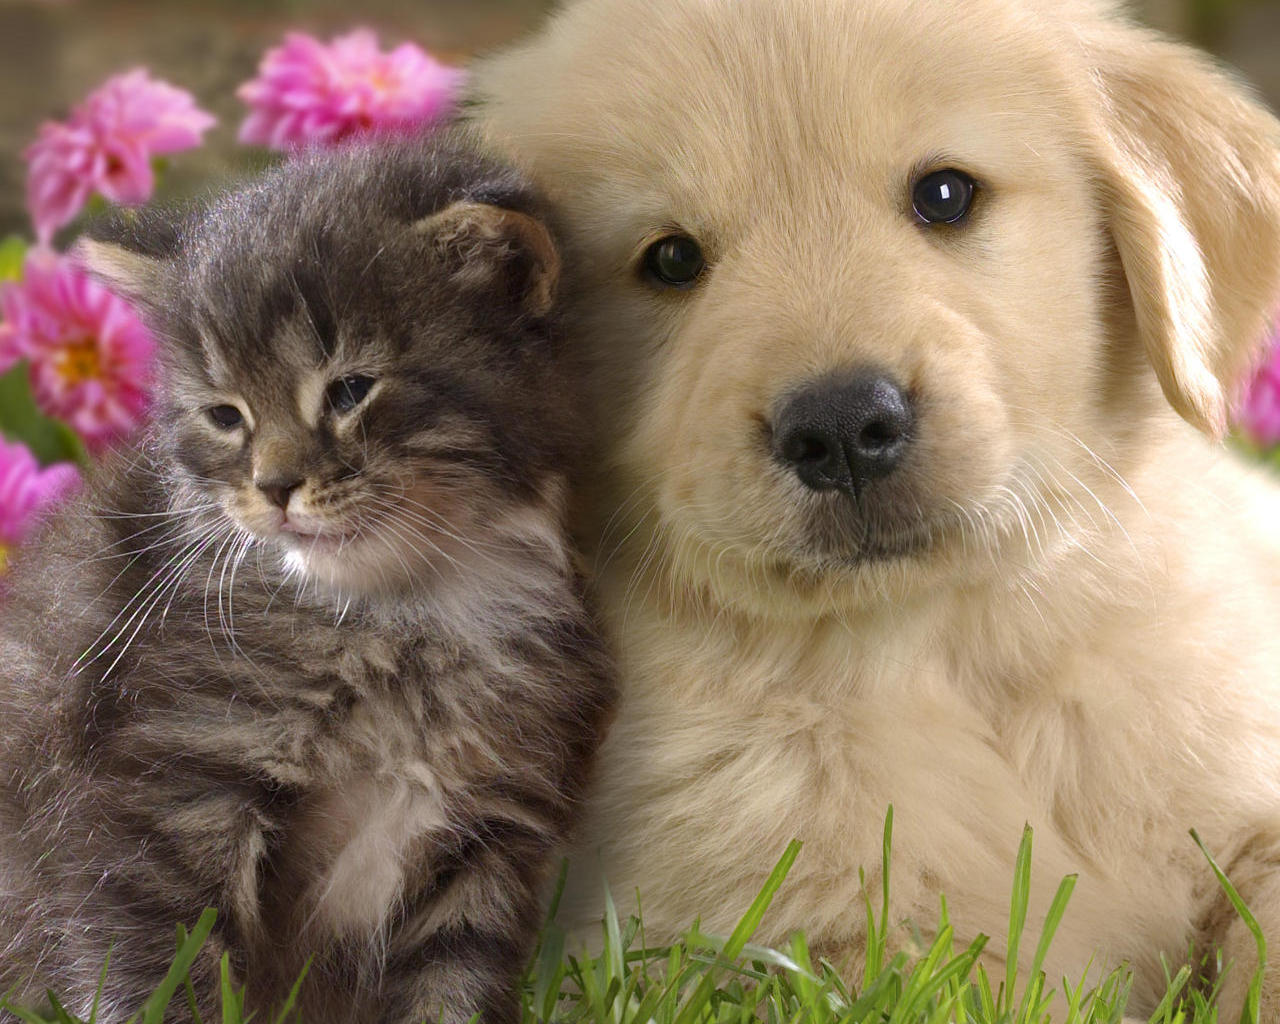 kittenwallpaperorgpuppy and kitten Wallpaper 1280x1024